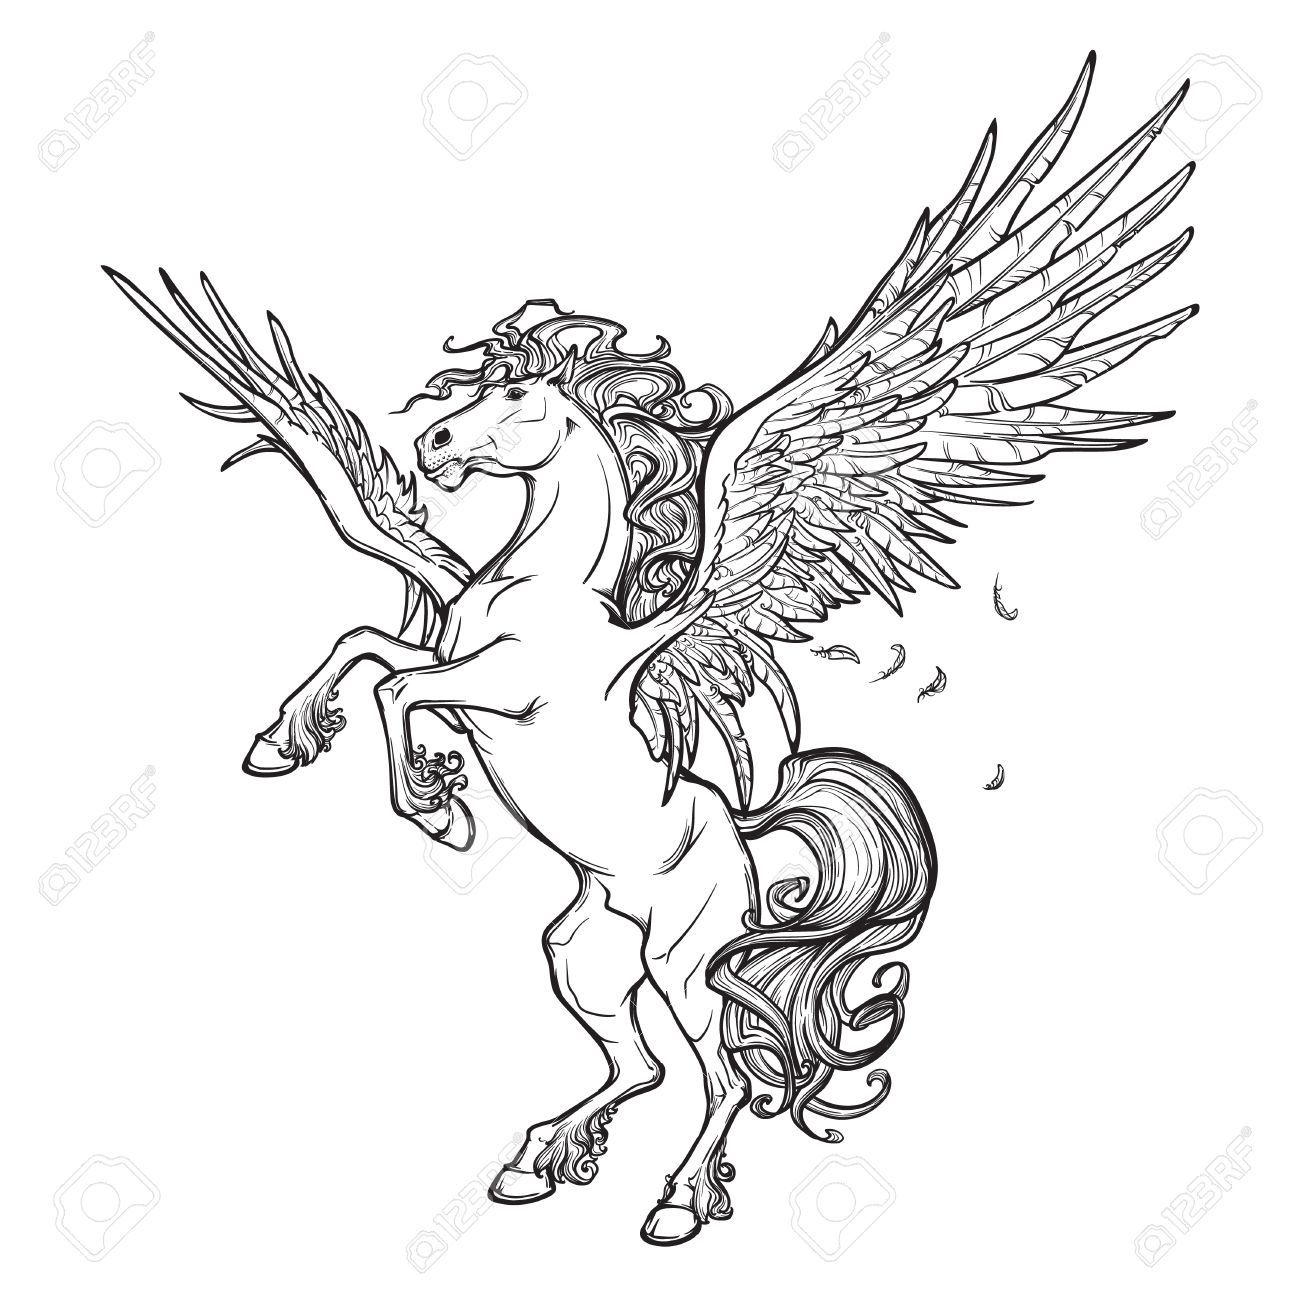 1300x1300 Pegasus Greek Mythological Creature. Legendary Beast Concept